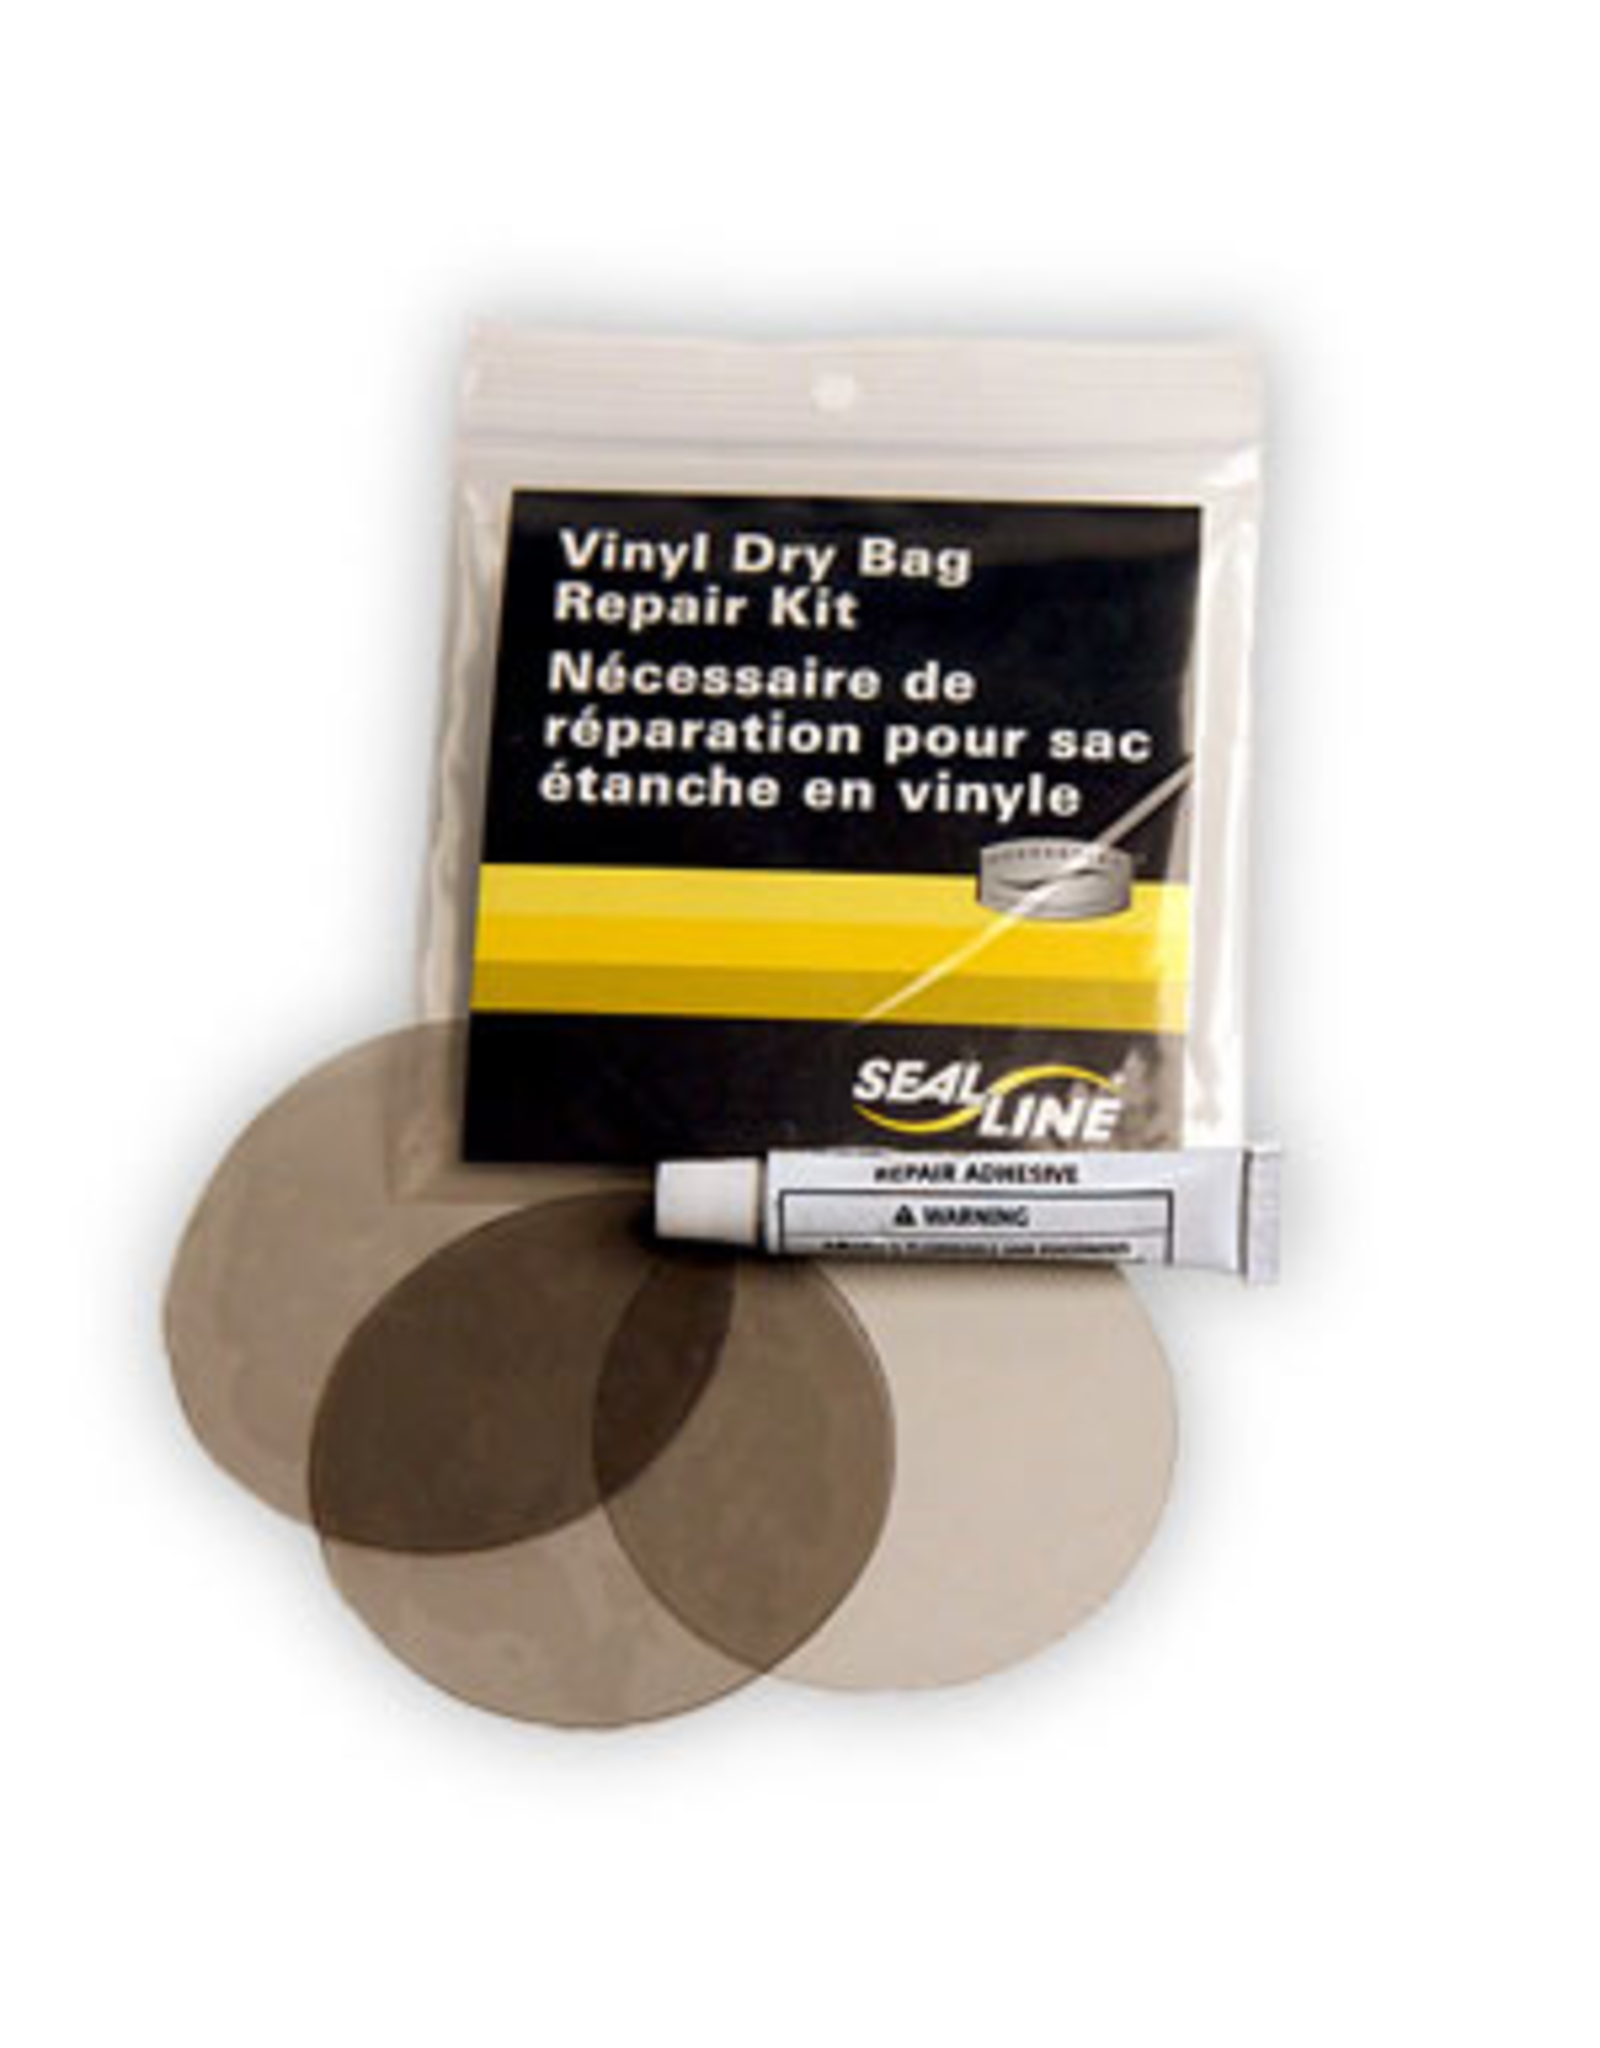 Sealline SealLine Vinyl Dry Bag Repair Kit Dry Bag